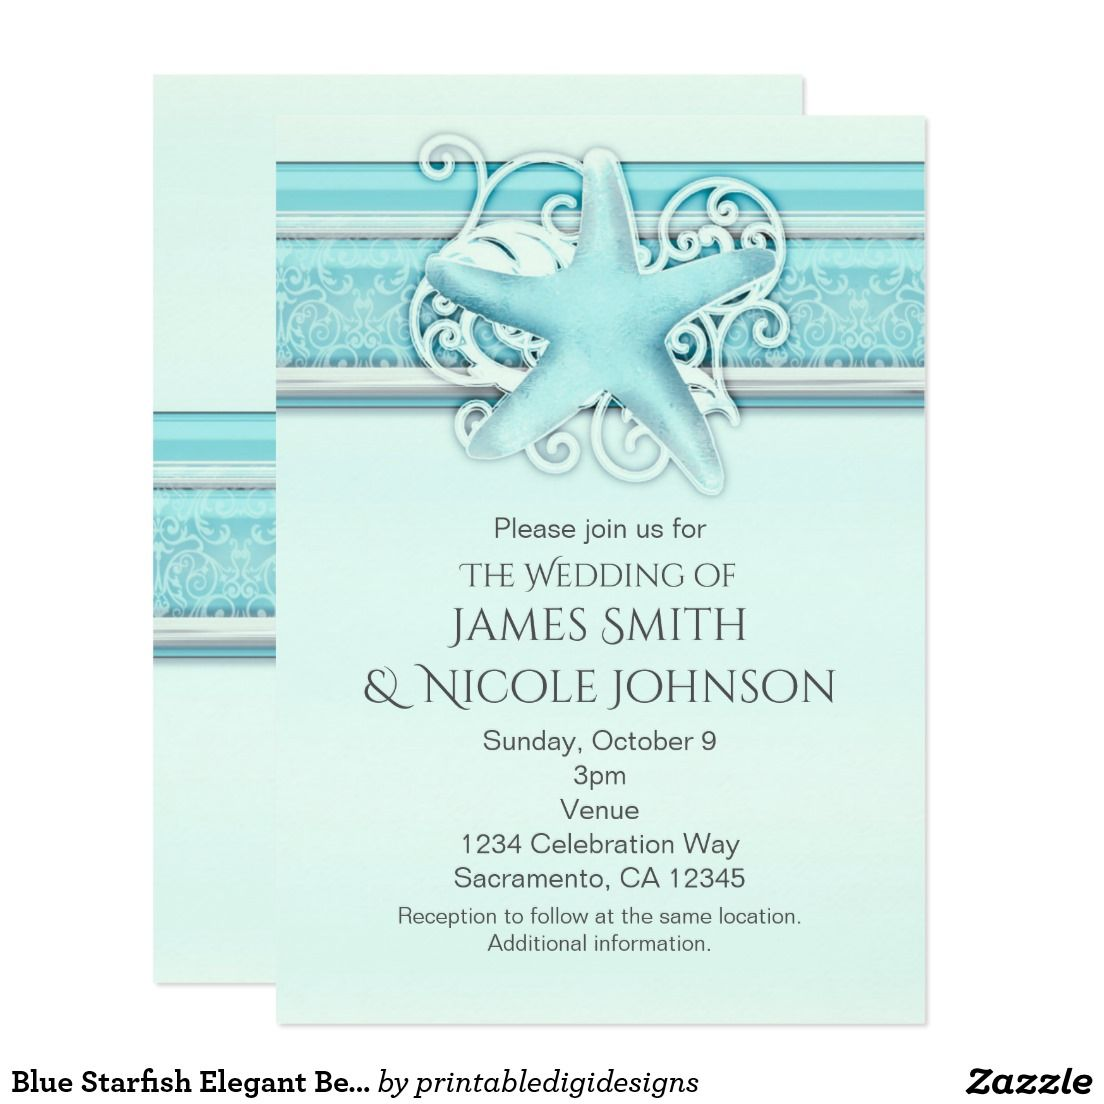 Blue Starfish Elegant Beach Themed Invitations | Sweet 16 ...